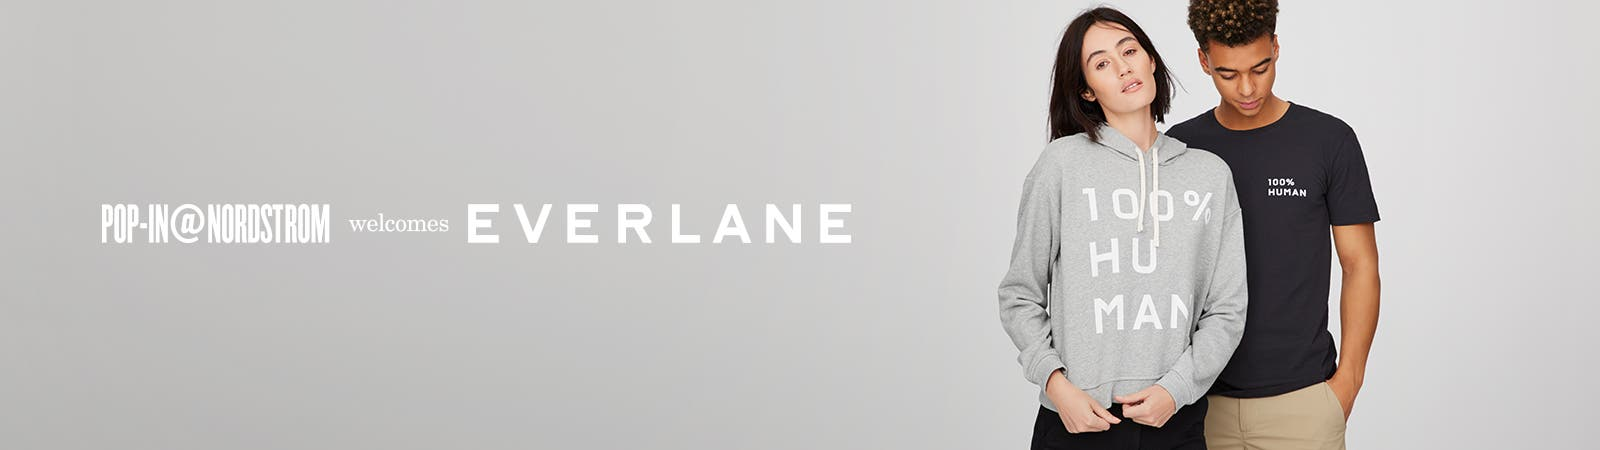 Pop-In@Nordstrom Welcomes Everlane.